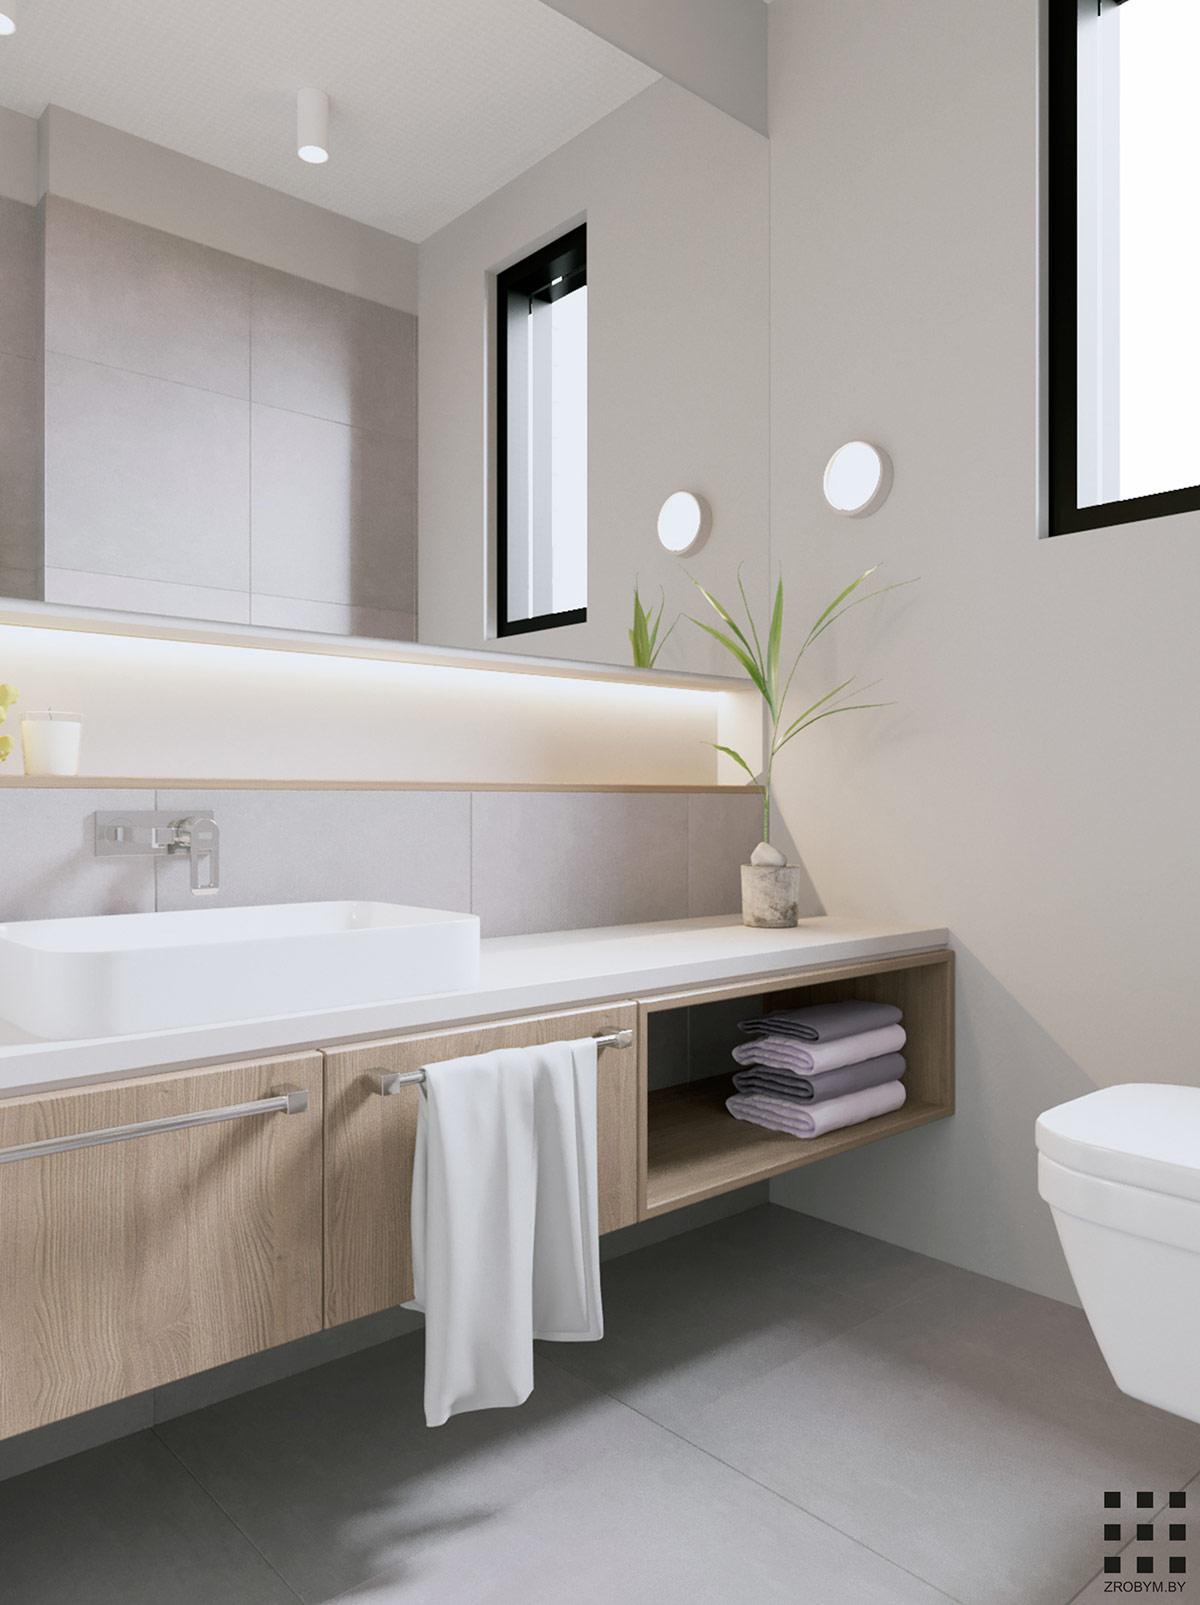 Bathroom Vanity With Towel Shelf Interior Design Ideas